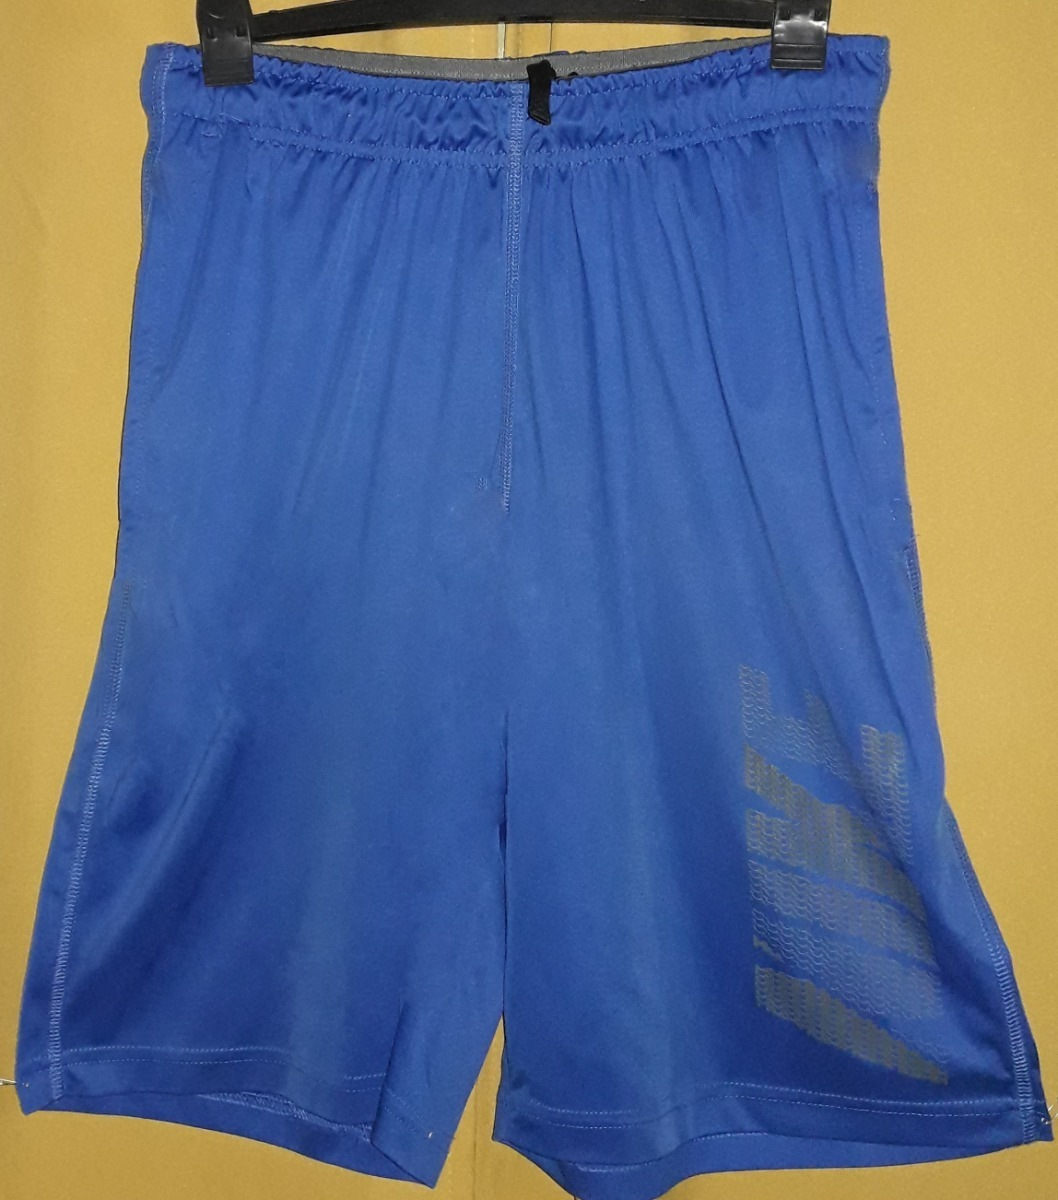 Bermuda Nike Dry-fit Importada De Hombres Talle S - $ 450,00